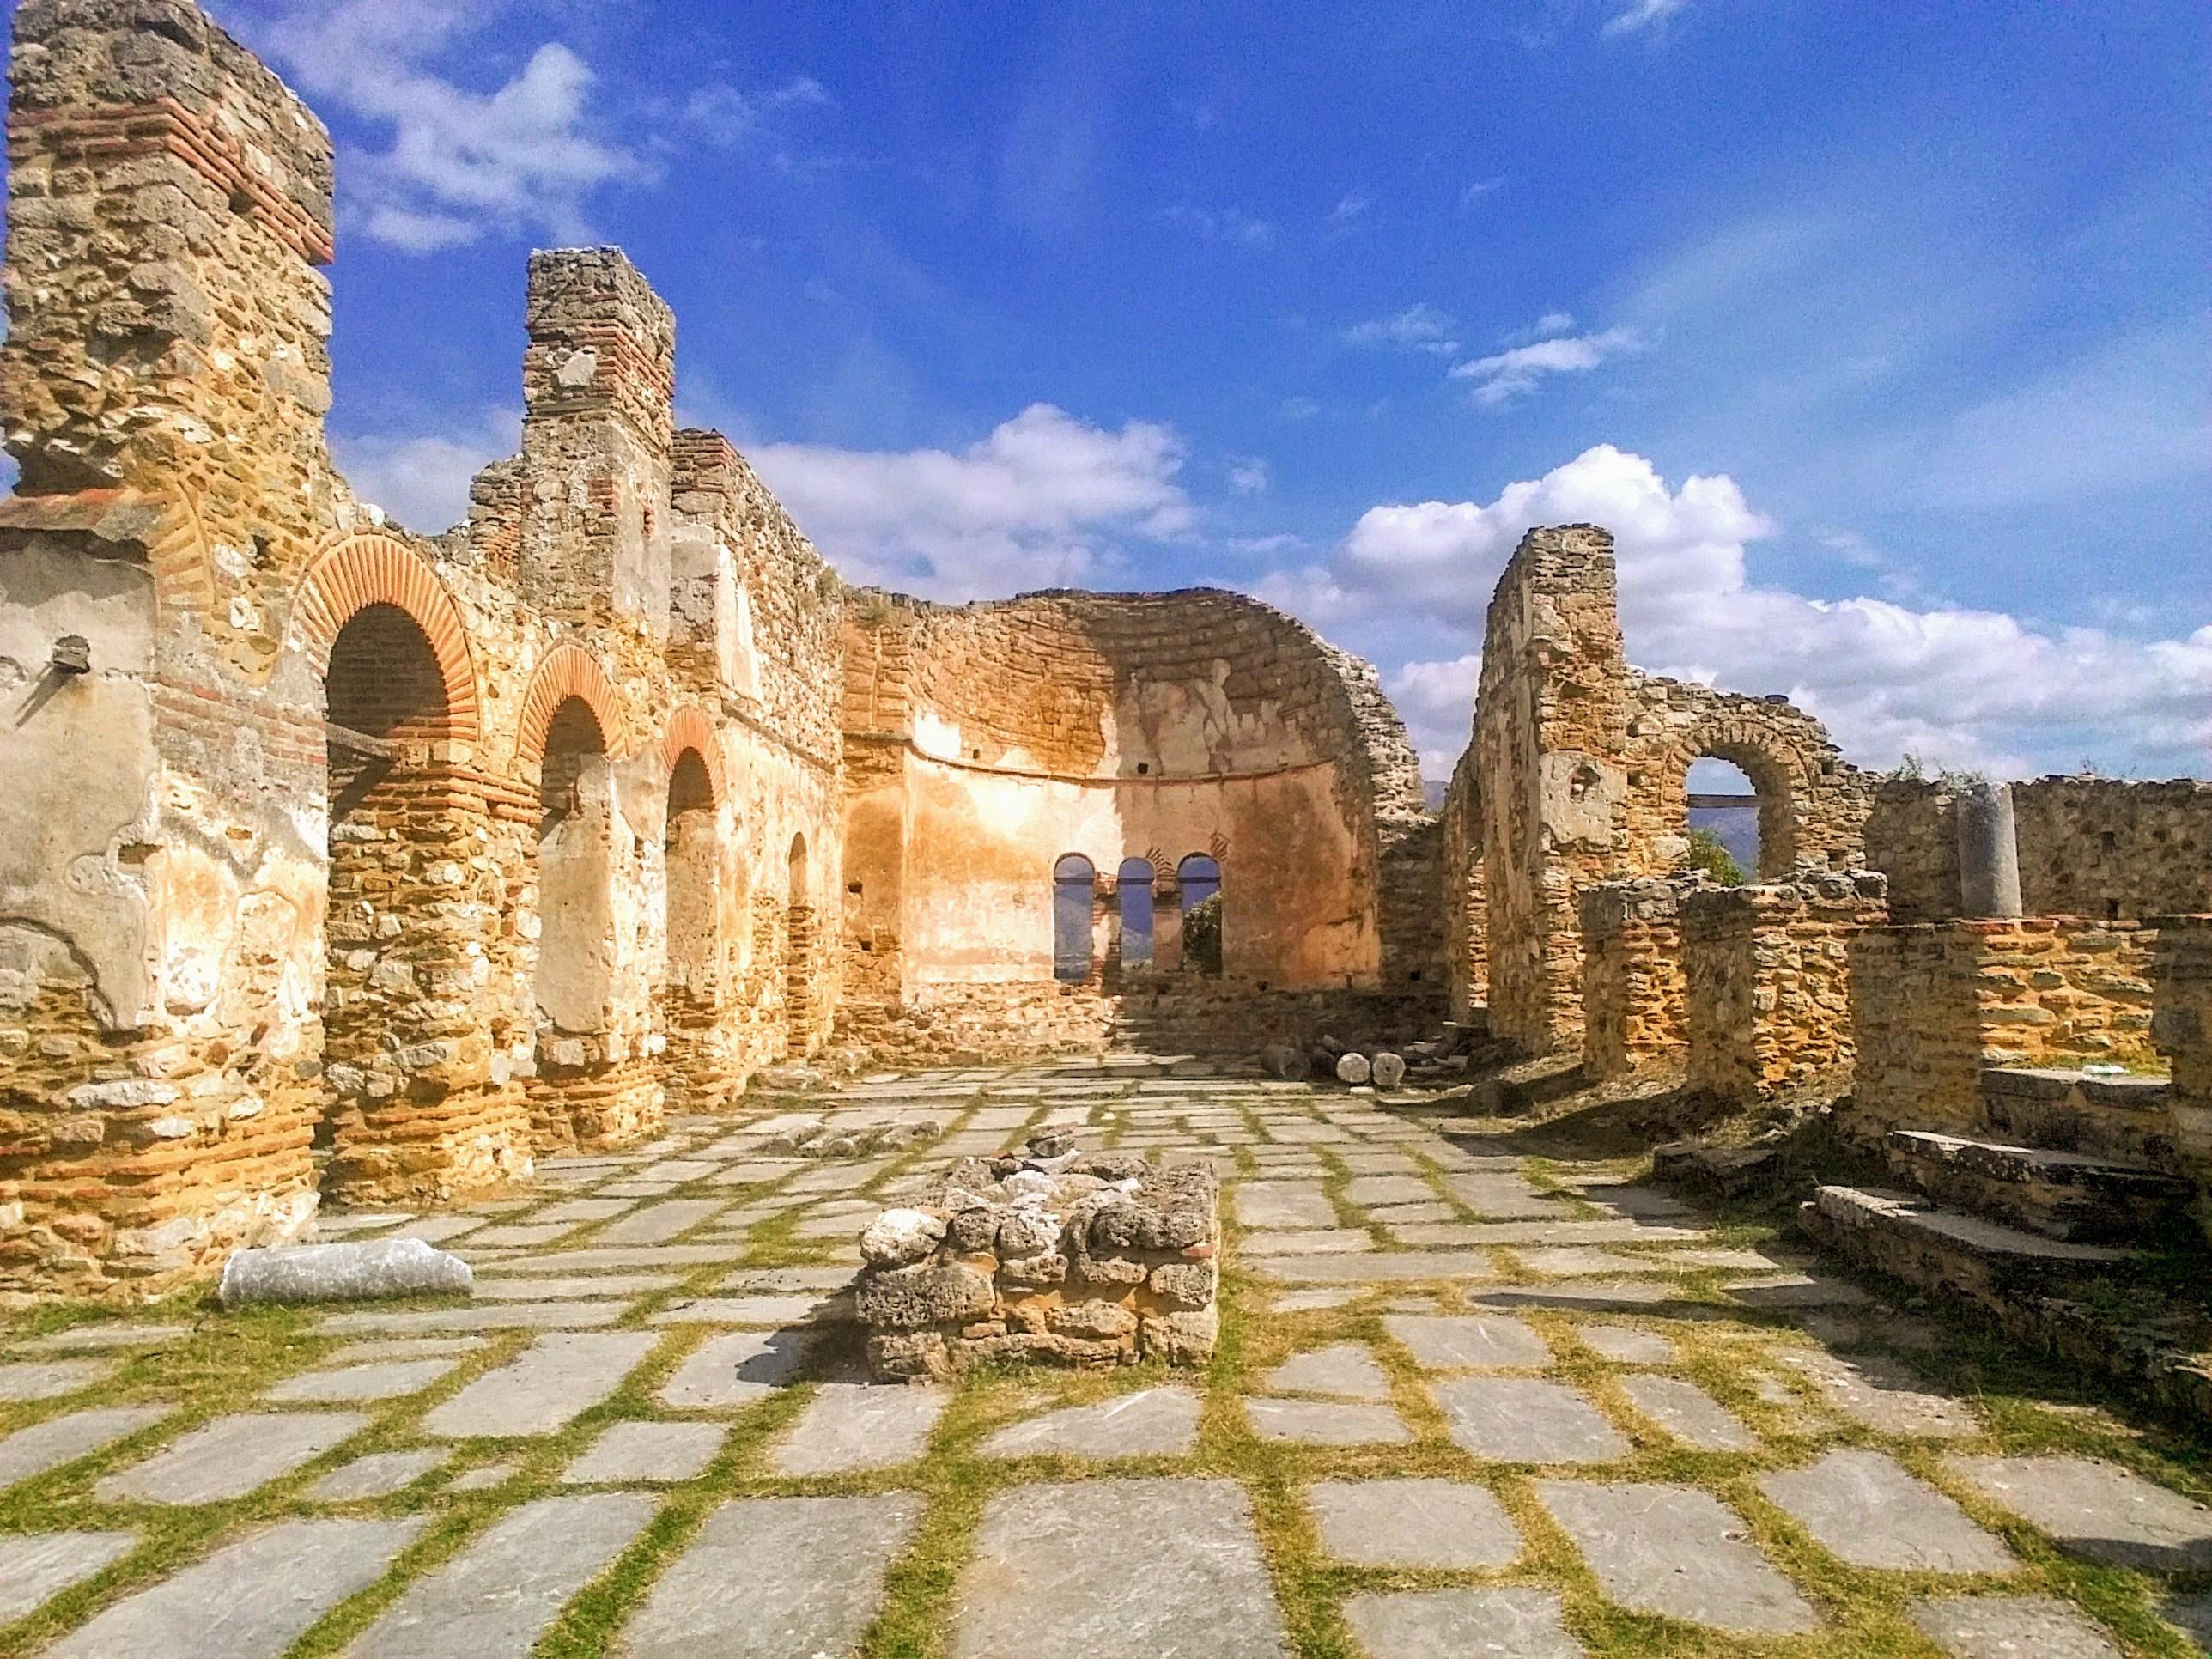 Church of Agios Achillios, Agios Achillios island, Prespa Lakes, Greece   © Ethel Dilouambaka